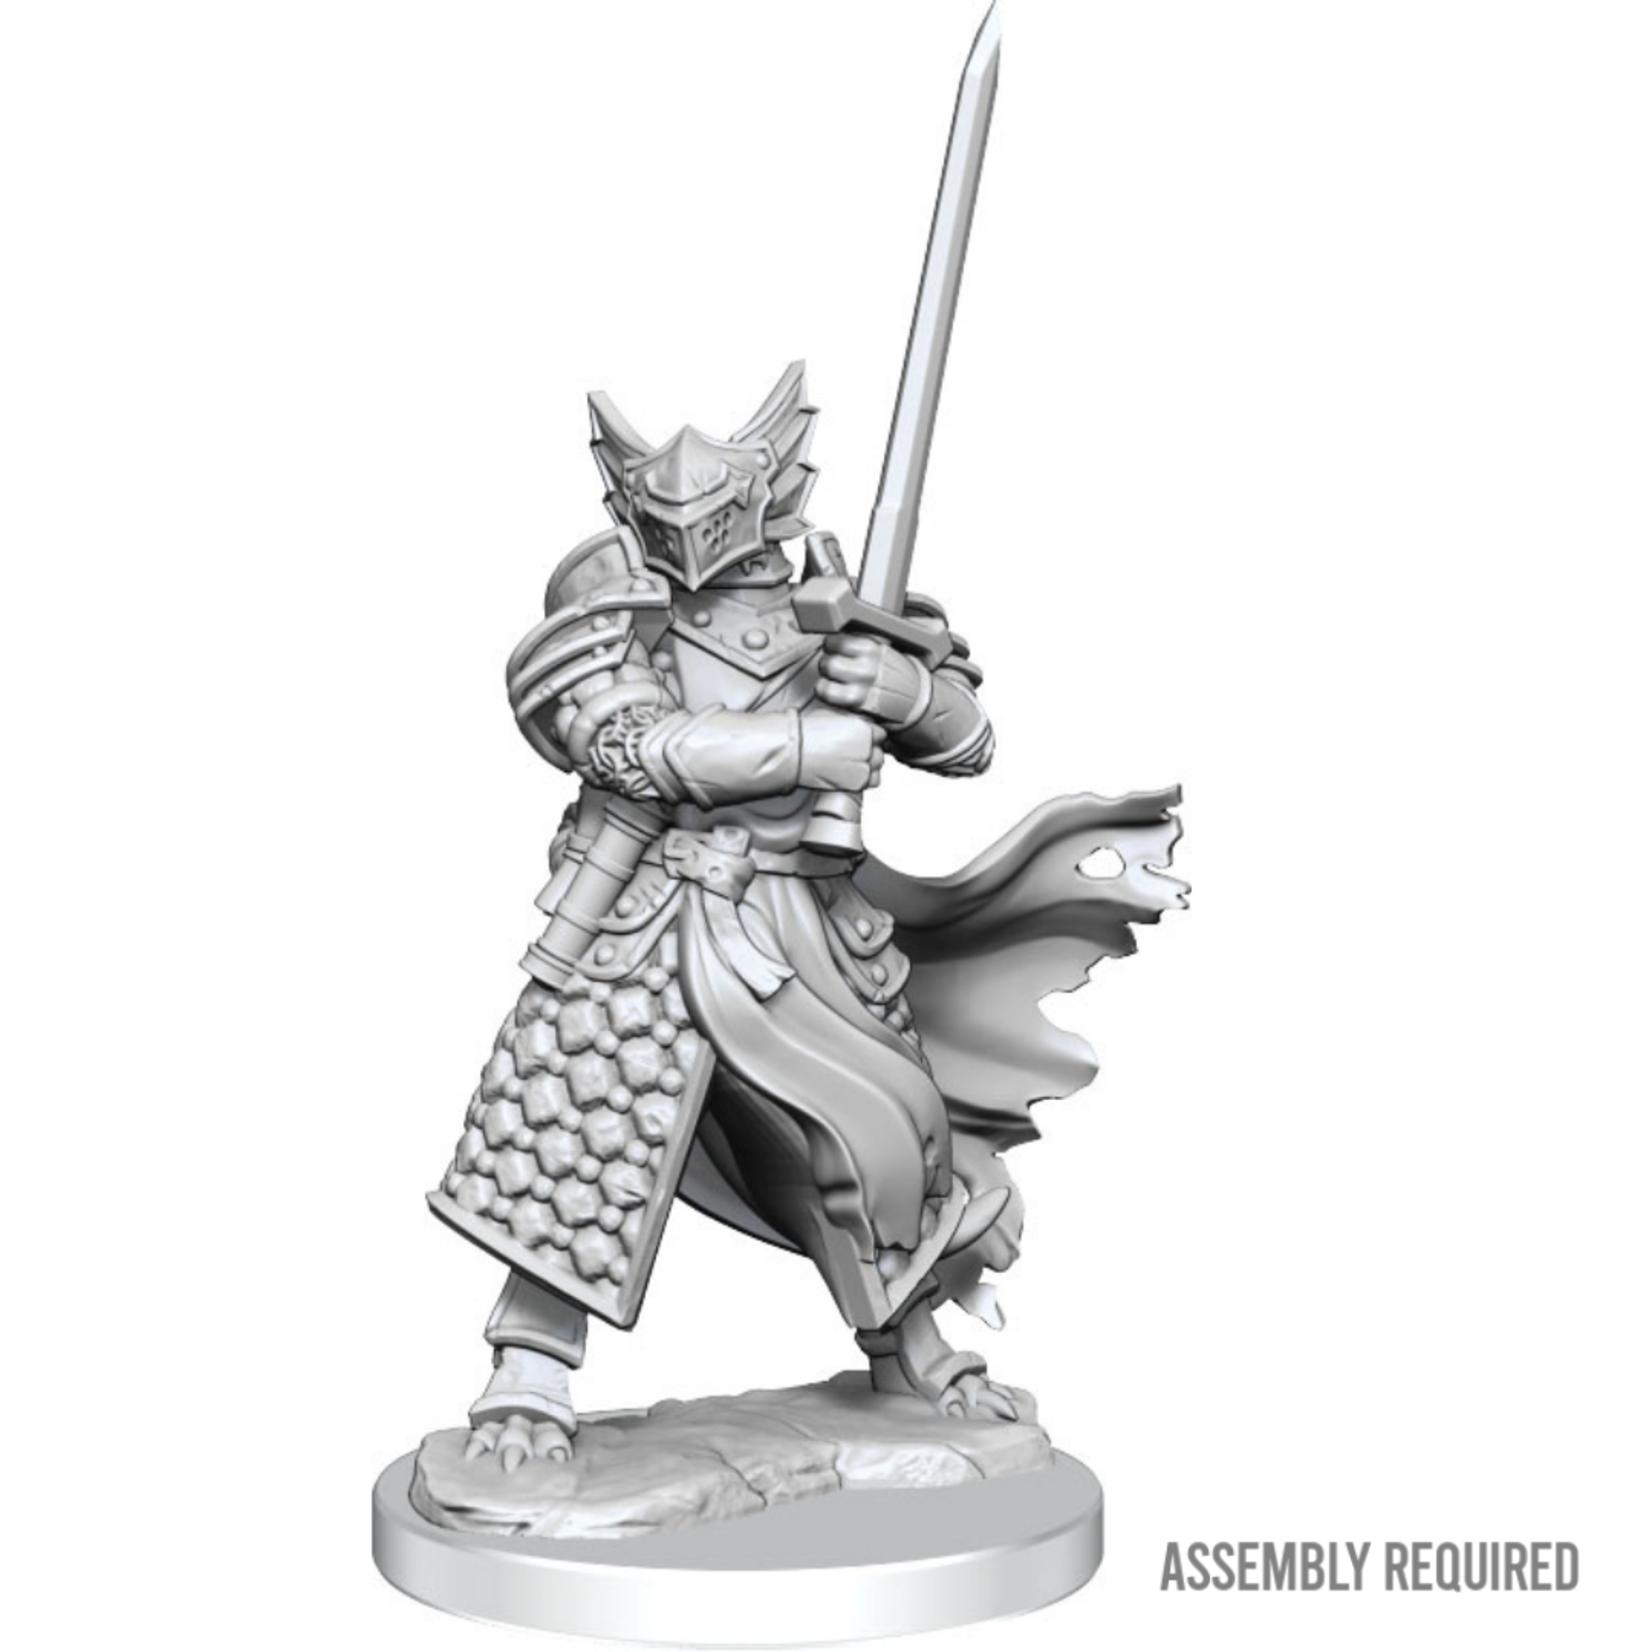 WizKids Wizkids Dungeons and Dragons Frameworks: Dragonborn Paladin Male W01 (Preorder)